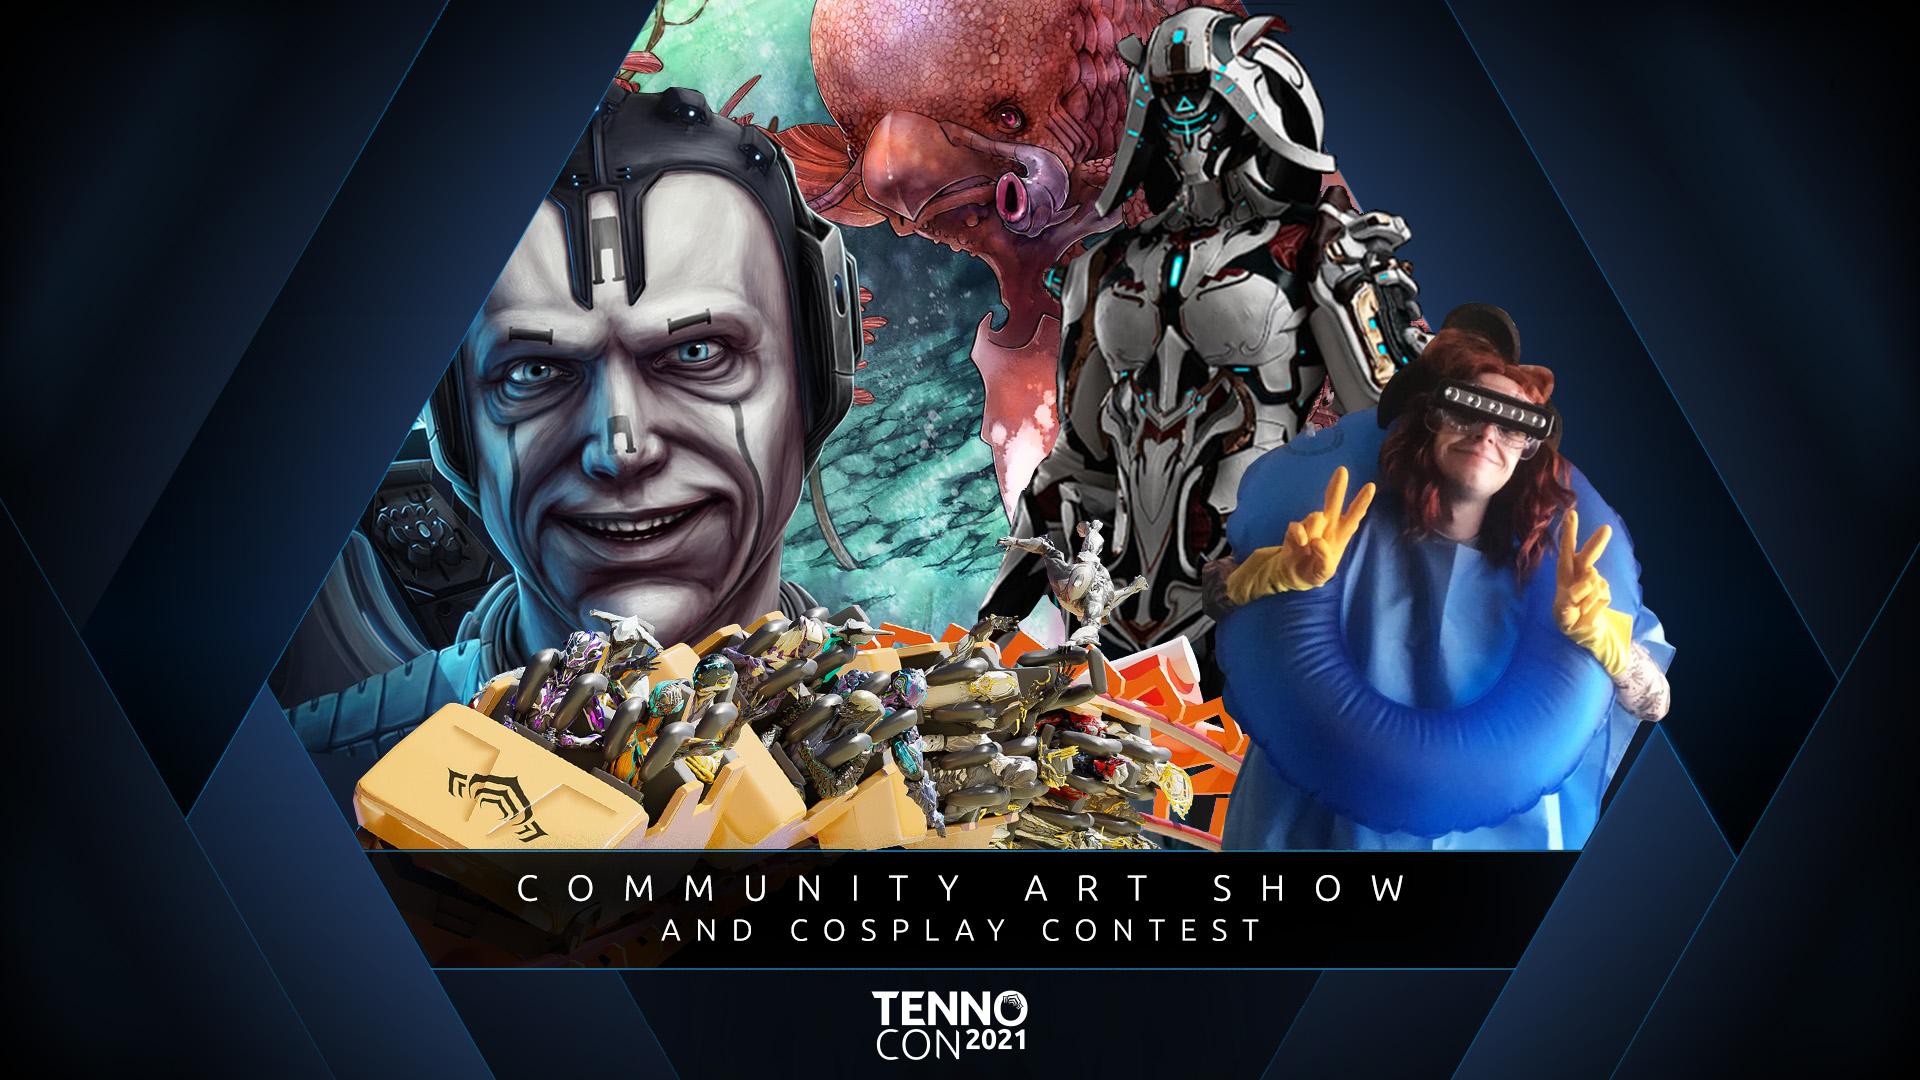 TennoCon2021_ArtCosplay_1080p.jpg.4b4c9e